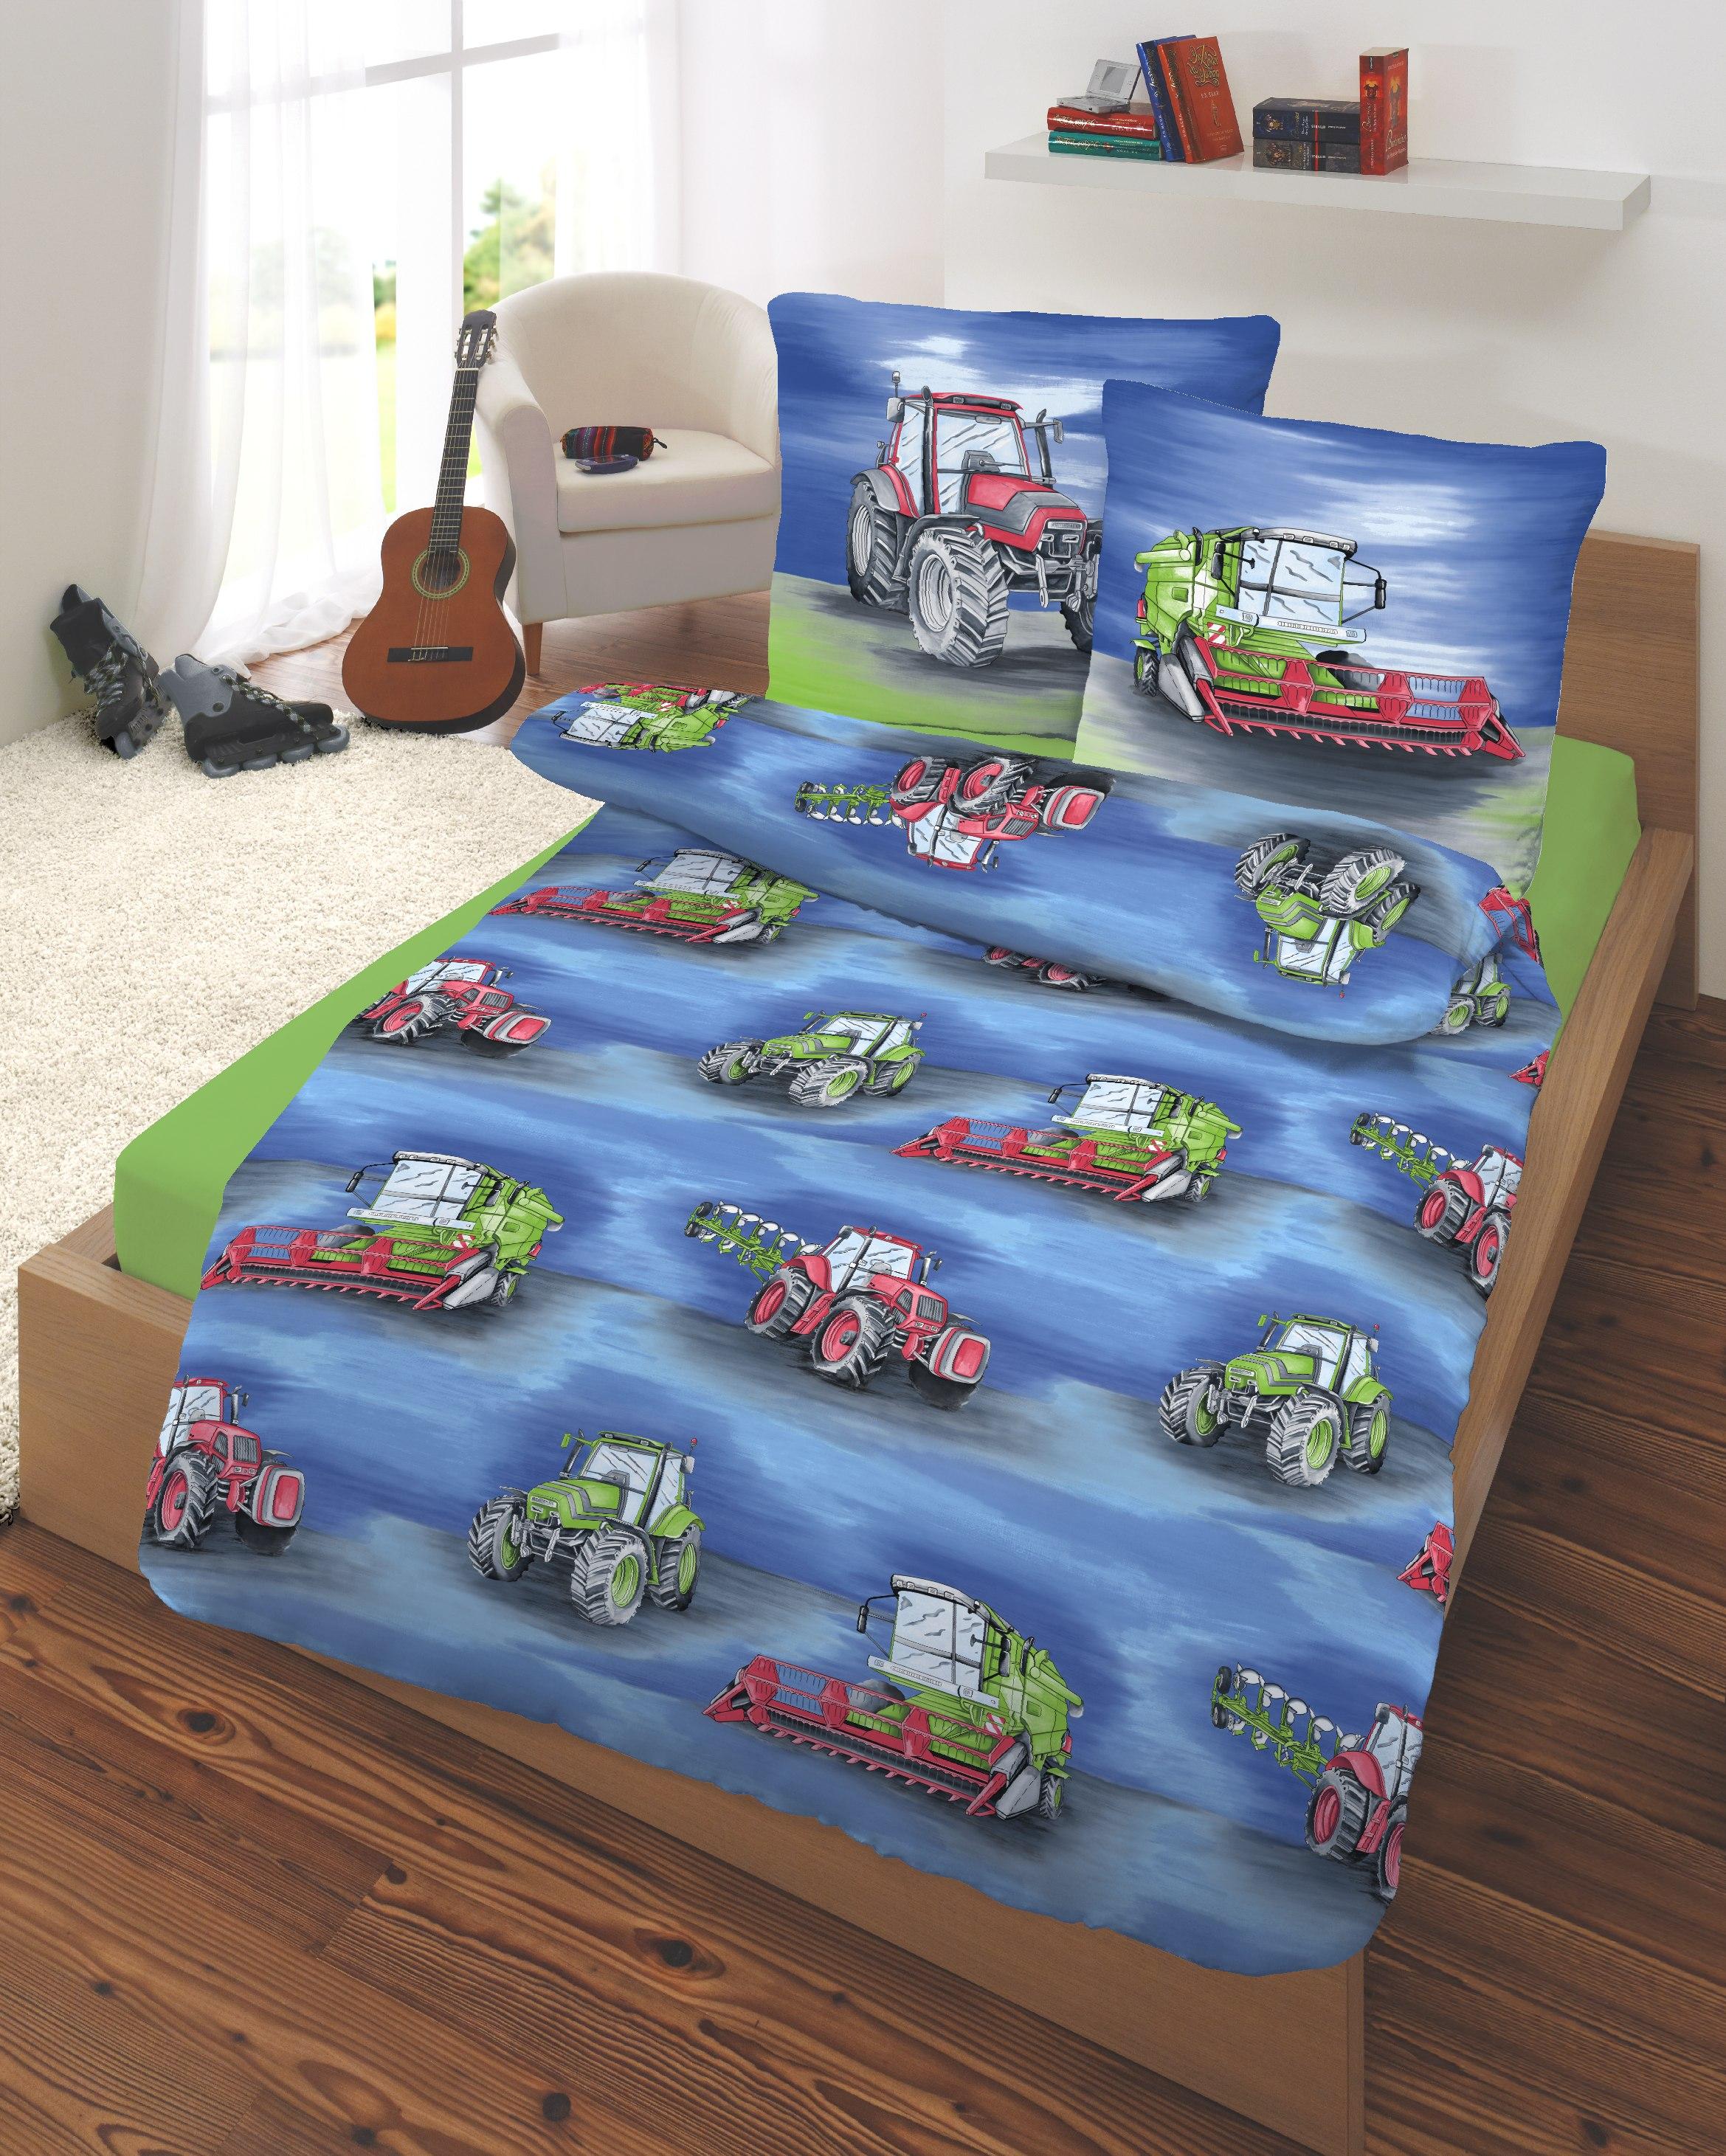 Feinbiber Bettwäsche Bettgarnitur 135x20080x80 Cm Traktor Bunt Ebay